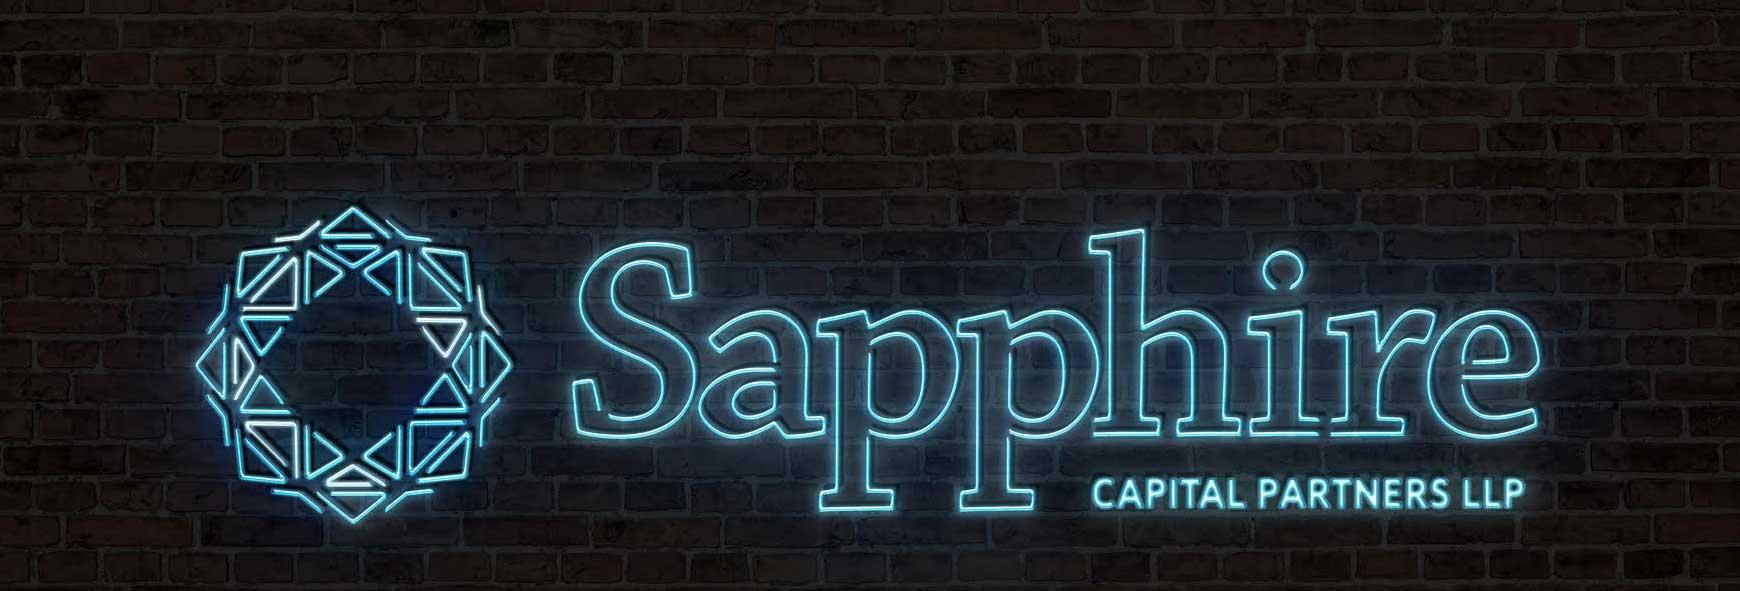 Sapphire-Capital-Partners-LLP